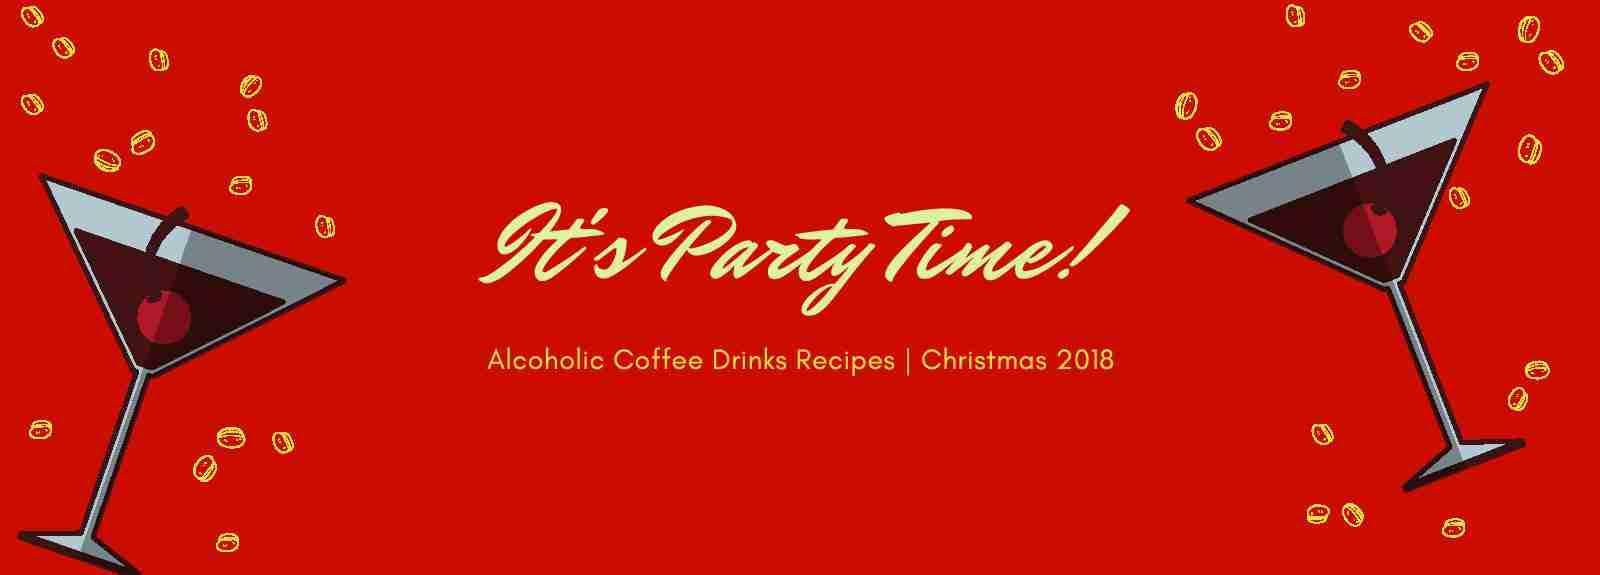 alcoholic-coffee-drinks-recipes